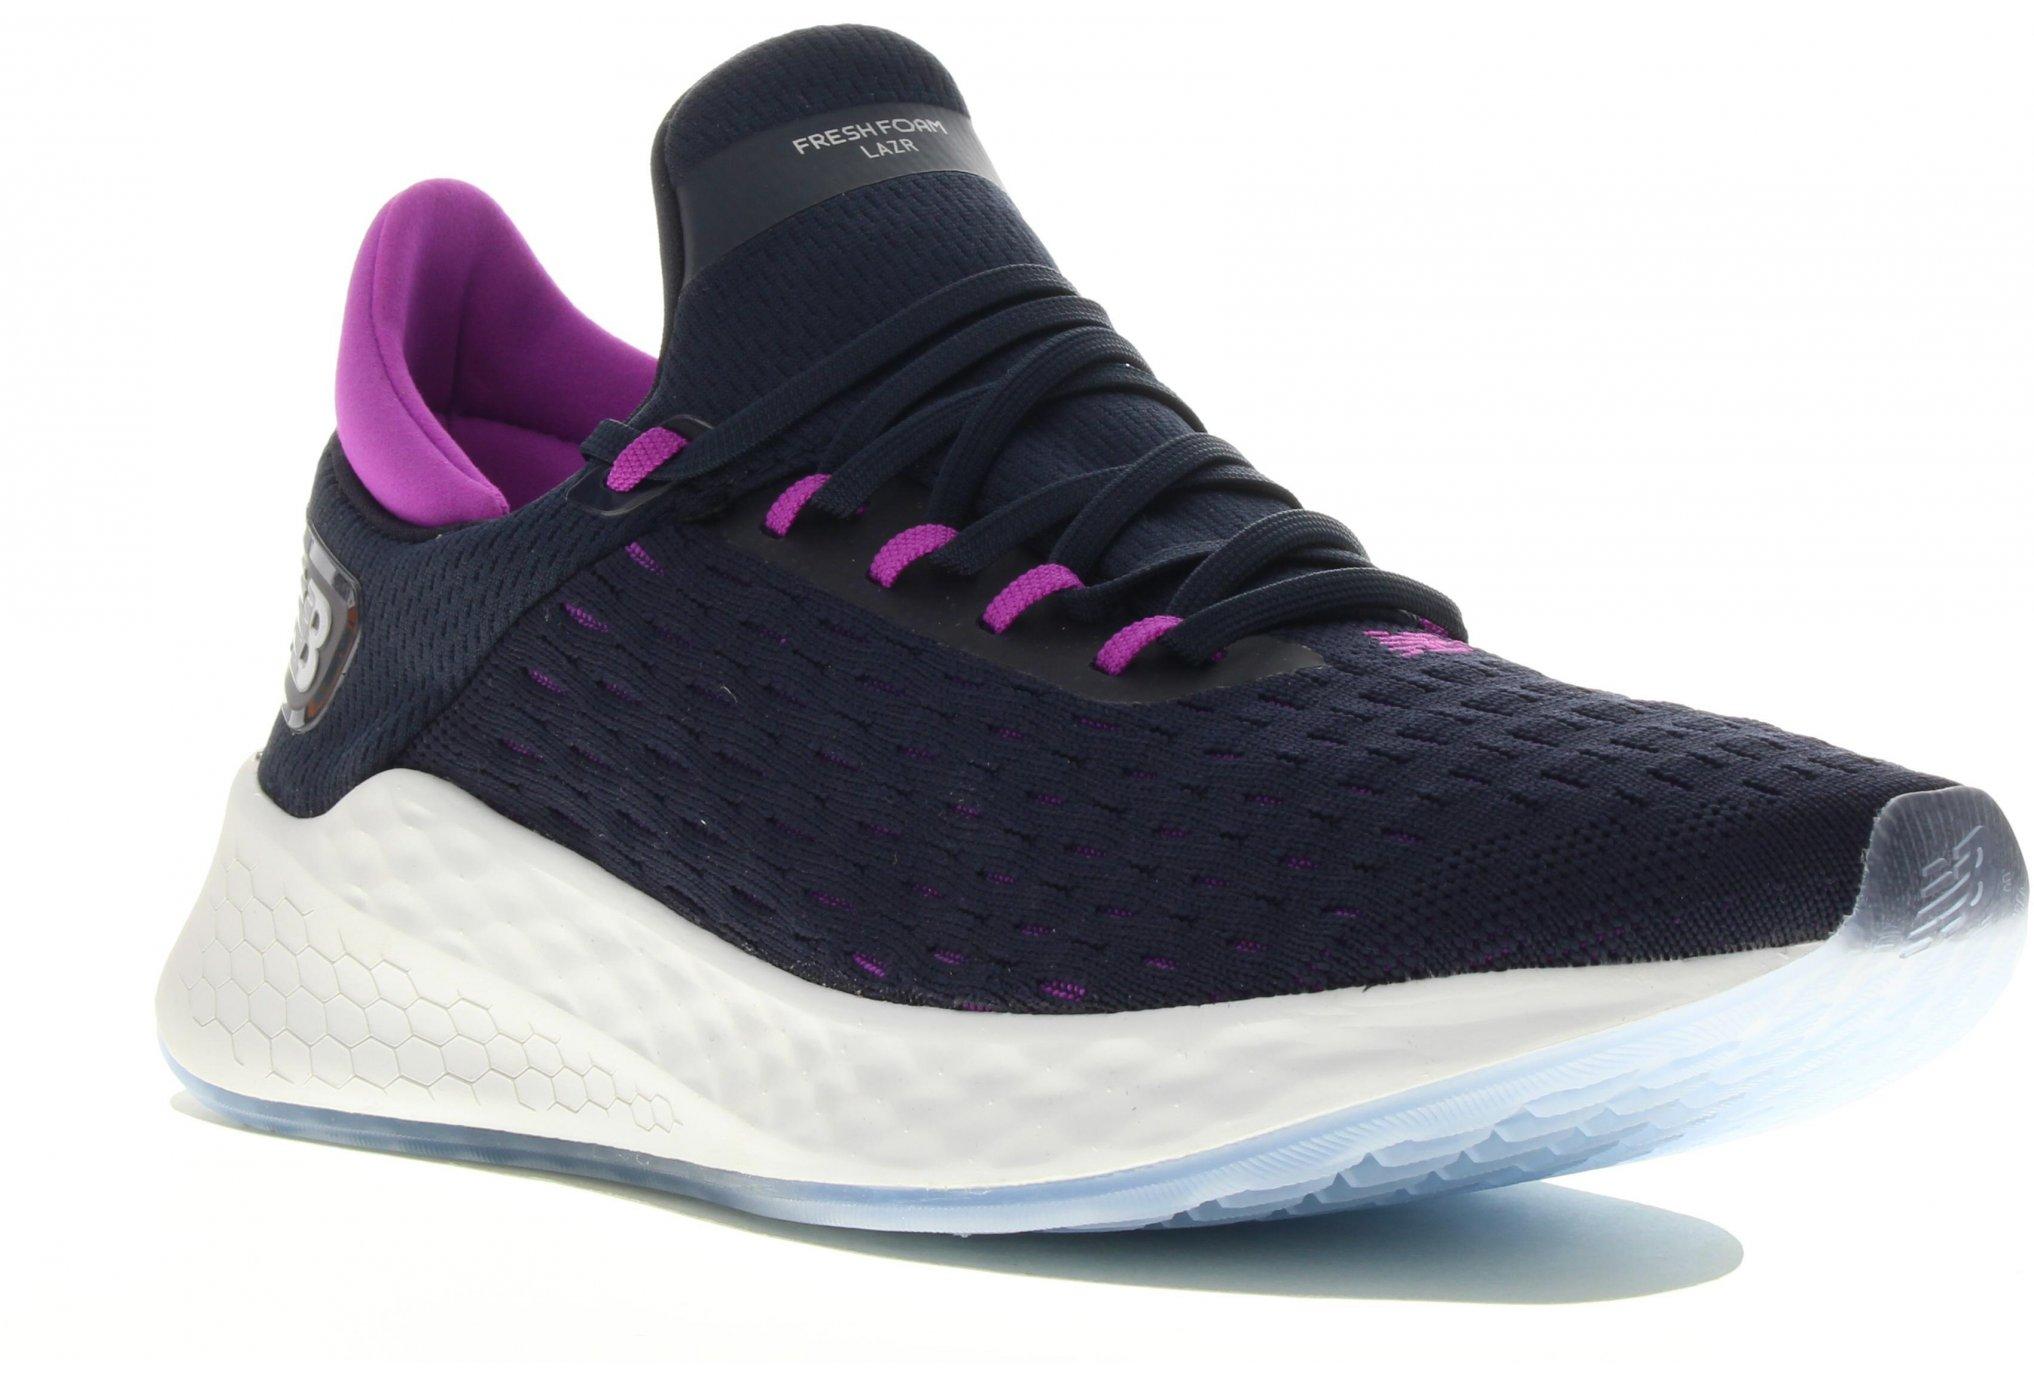 New Balance Fresh Foam Lazr V2 Hypoknit Chaussures running femme